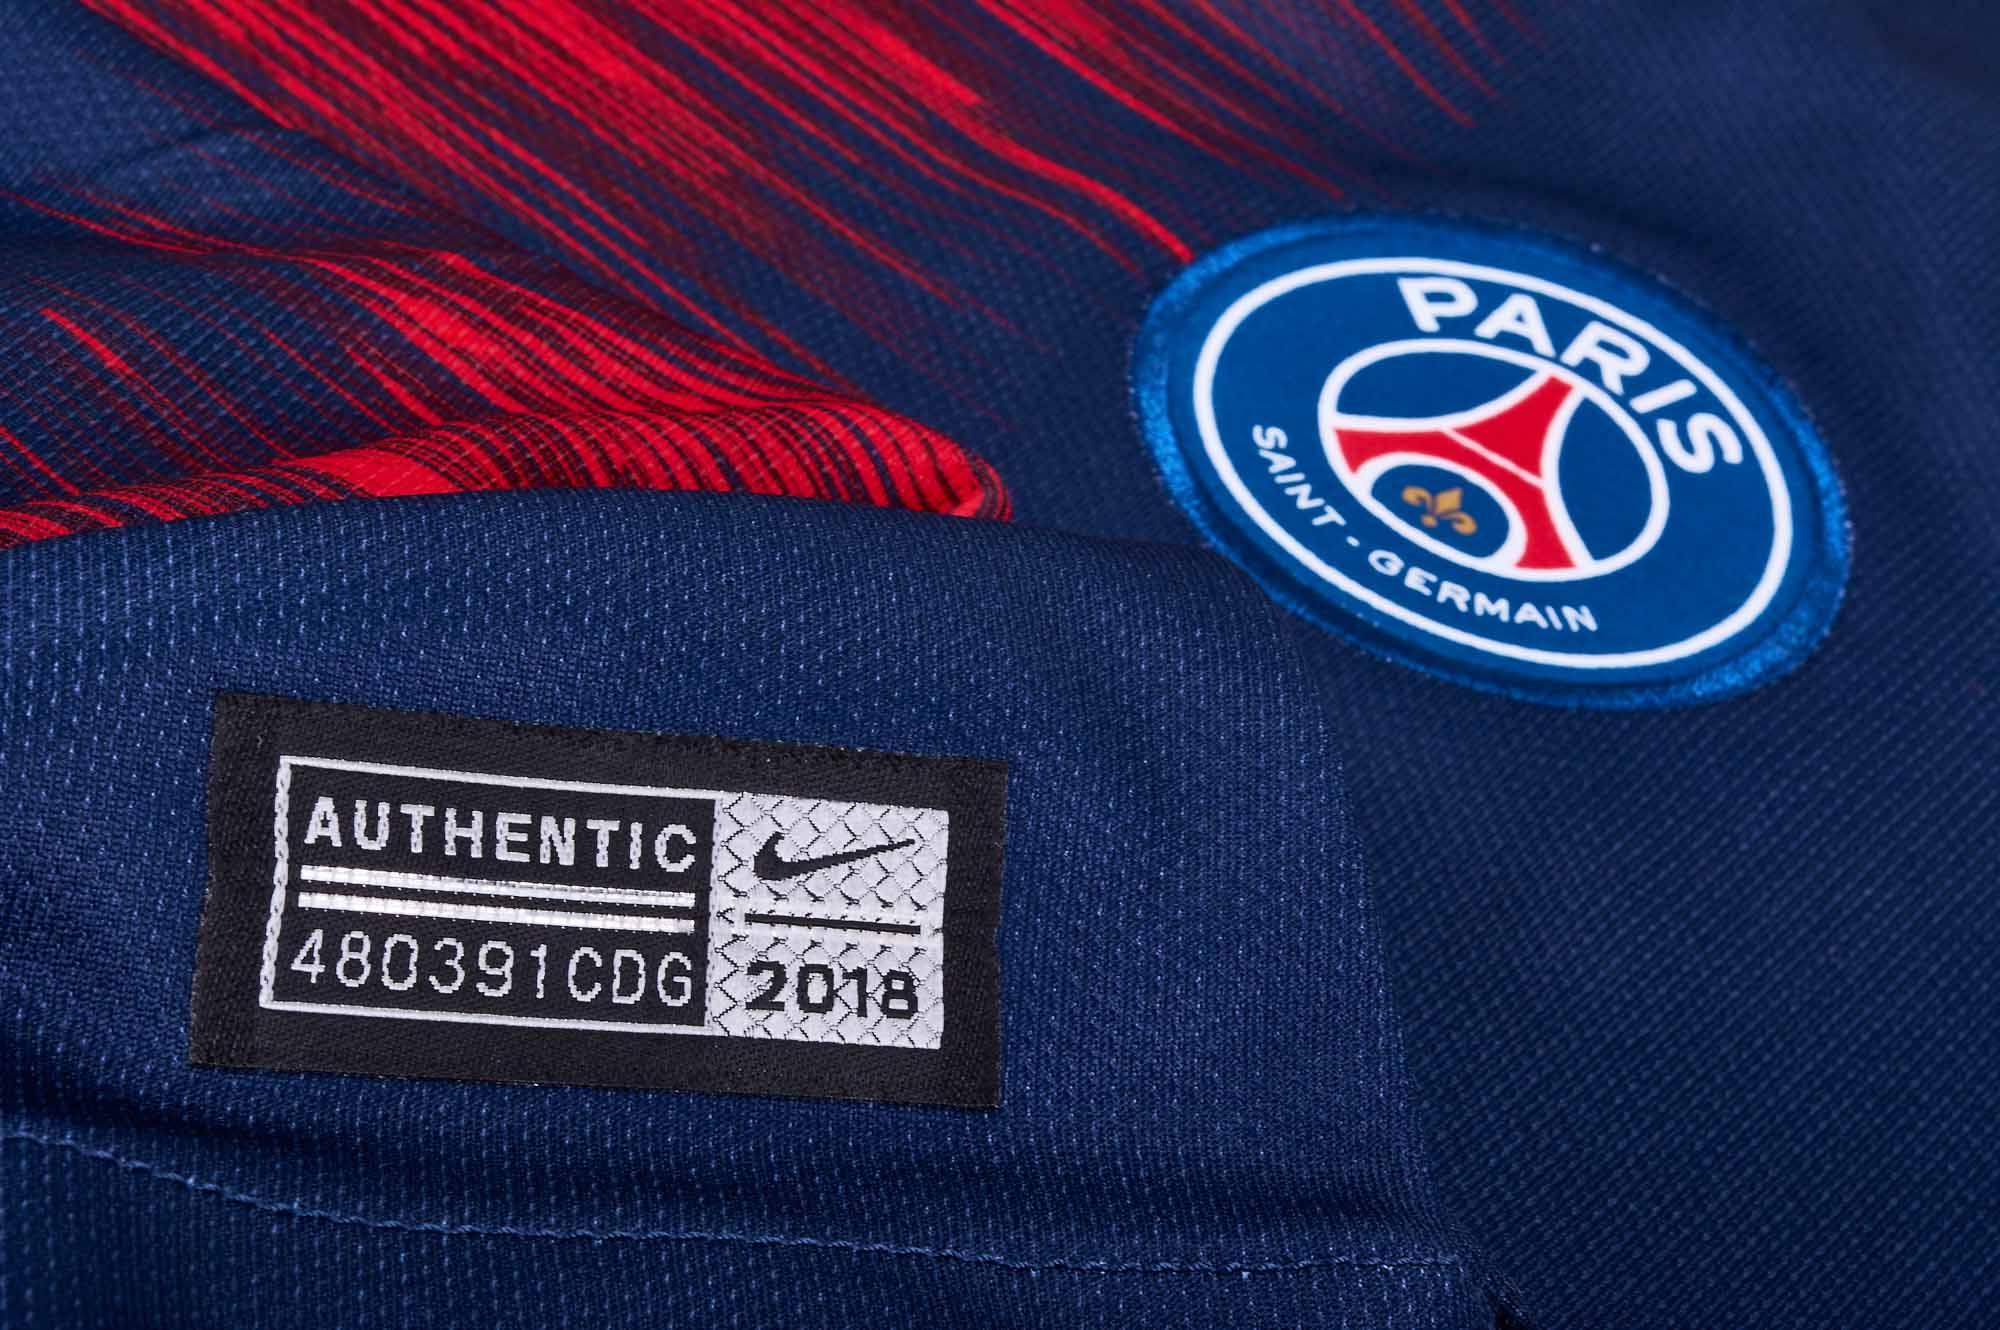 8c2c066c6d4 Nike PSG Home Jersey - Womens 2018-19 - SoccerPro